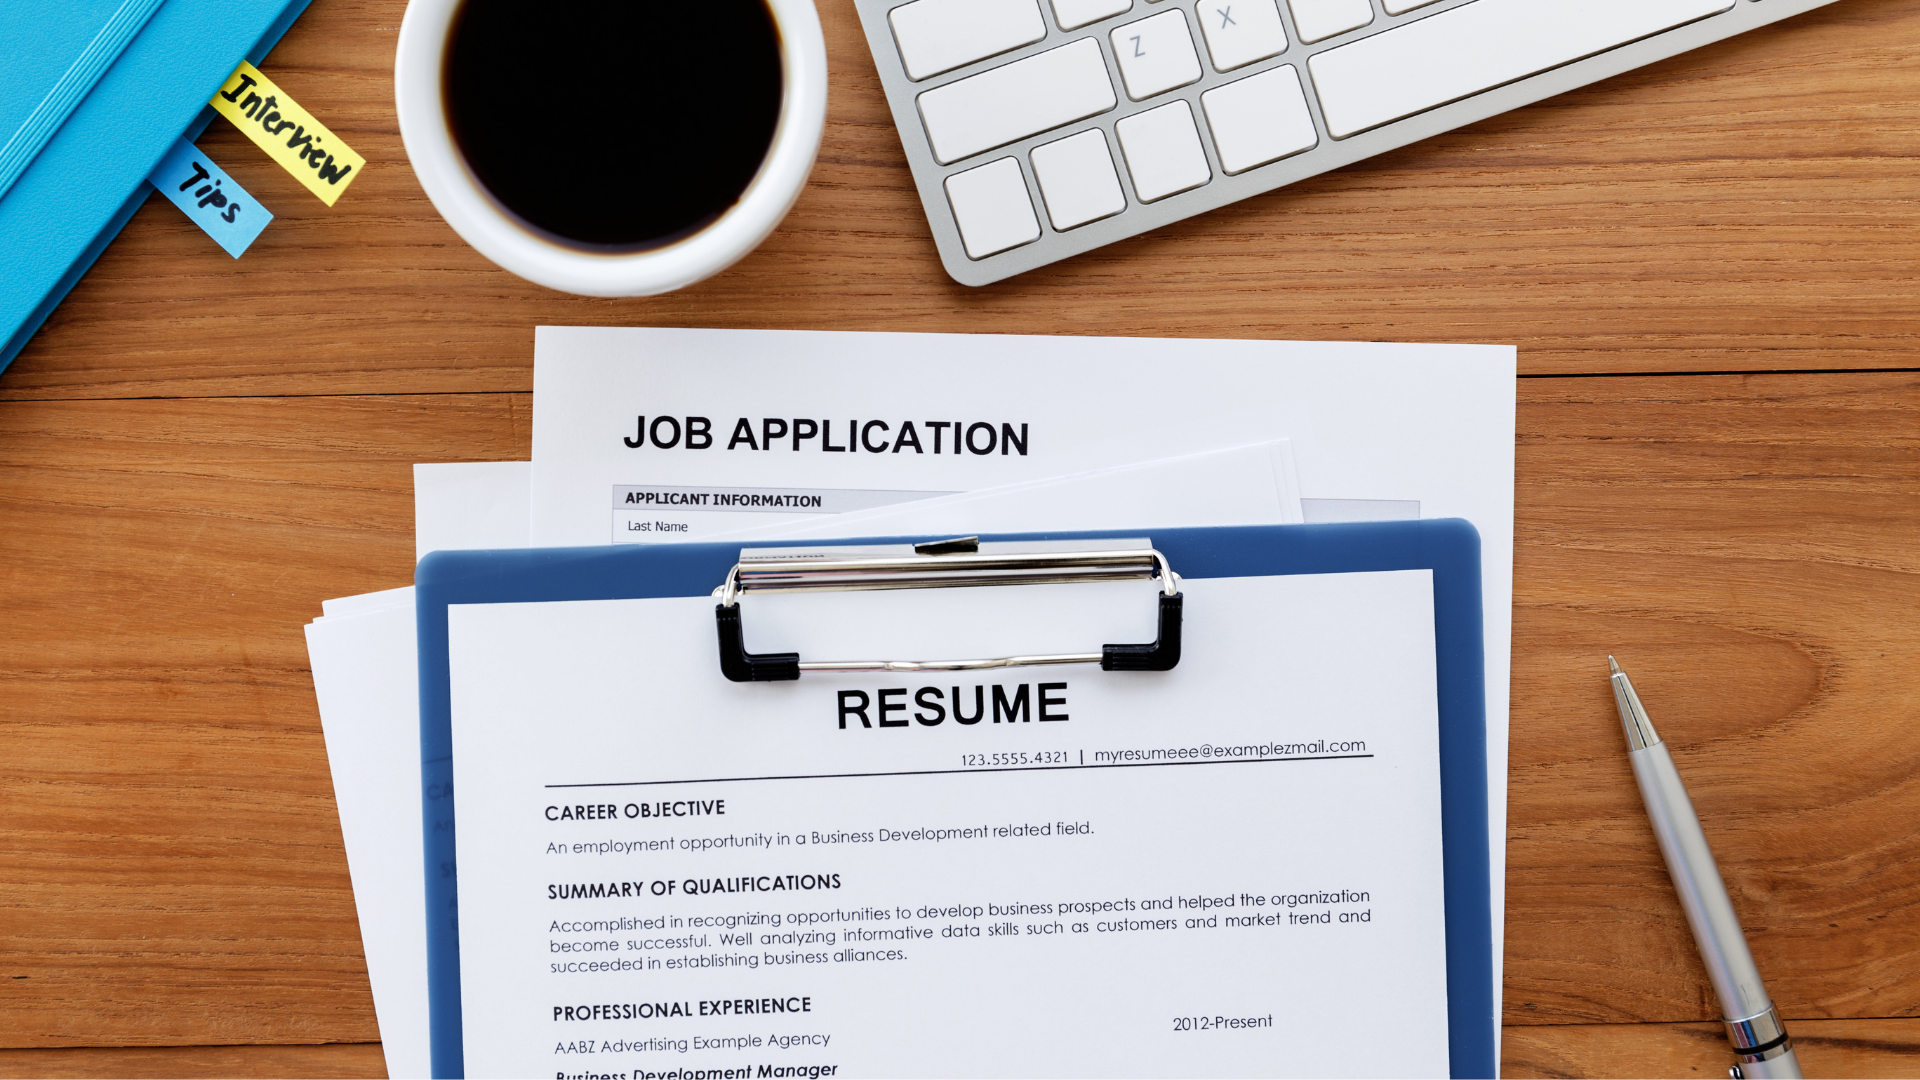 Image shows a job application on a desk.